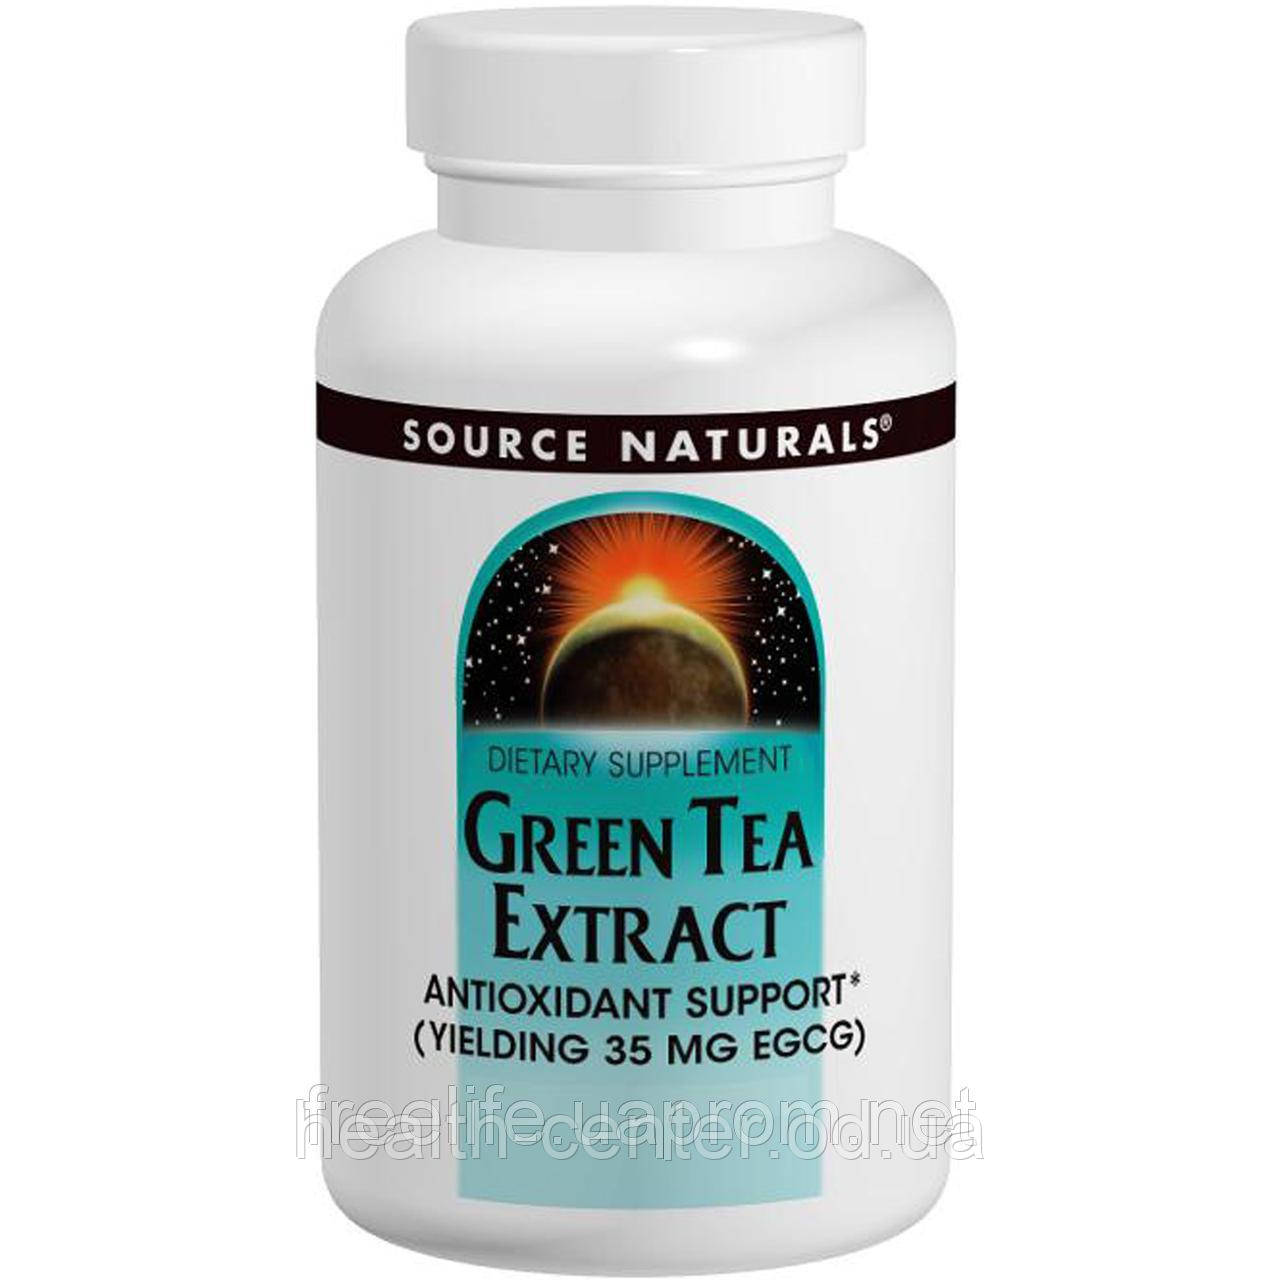 Экстракт зеленого чая 100 мг 60 таб (35 мг ЭГКГ) антиоксидант онкопротектор Source Naturals USA